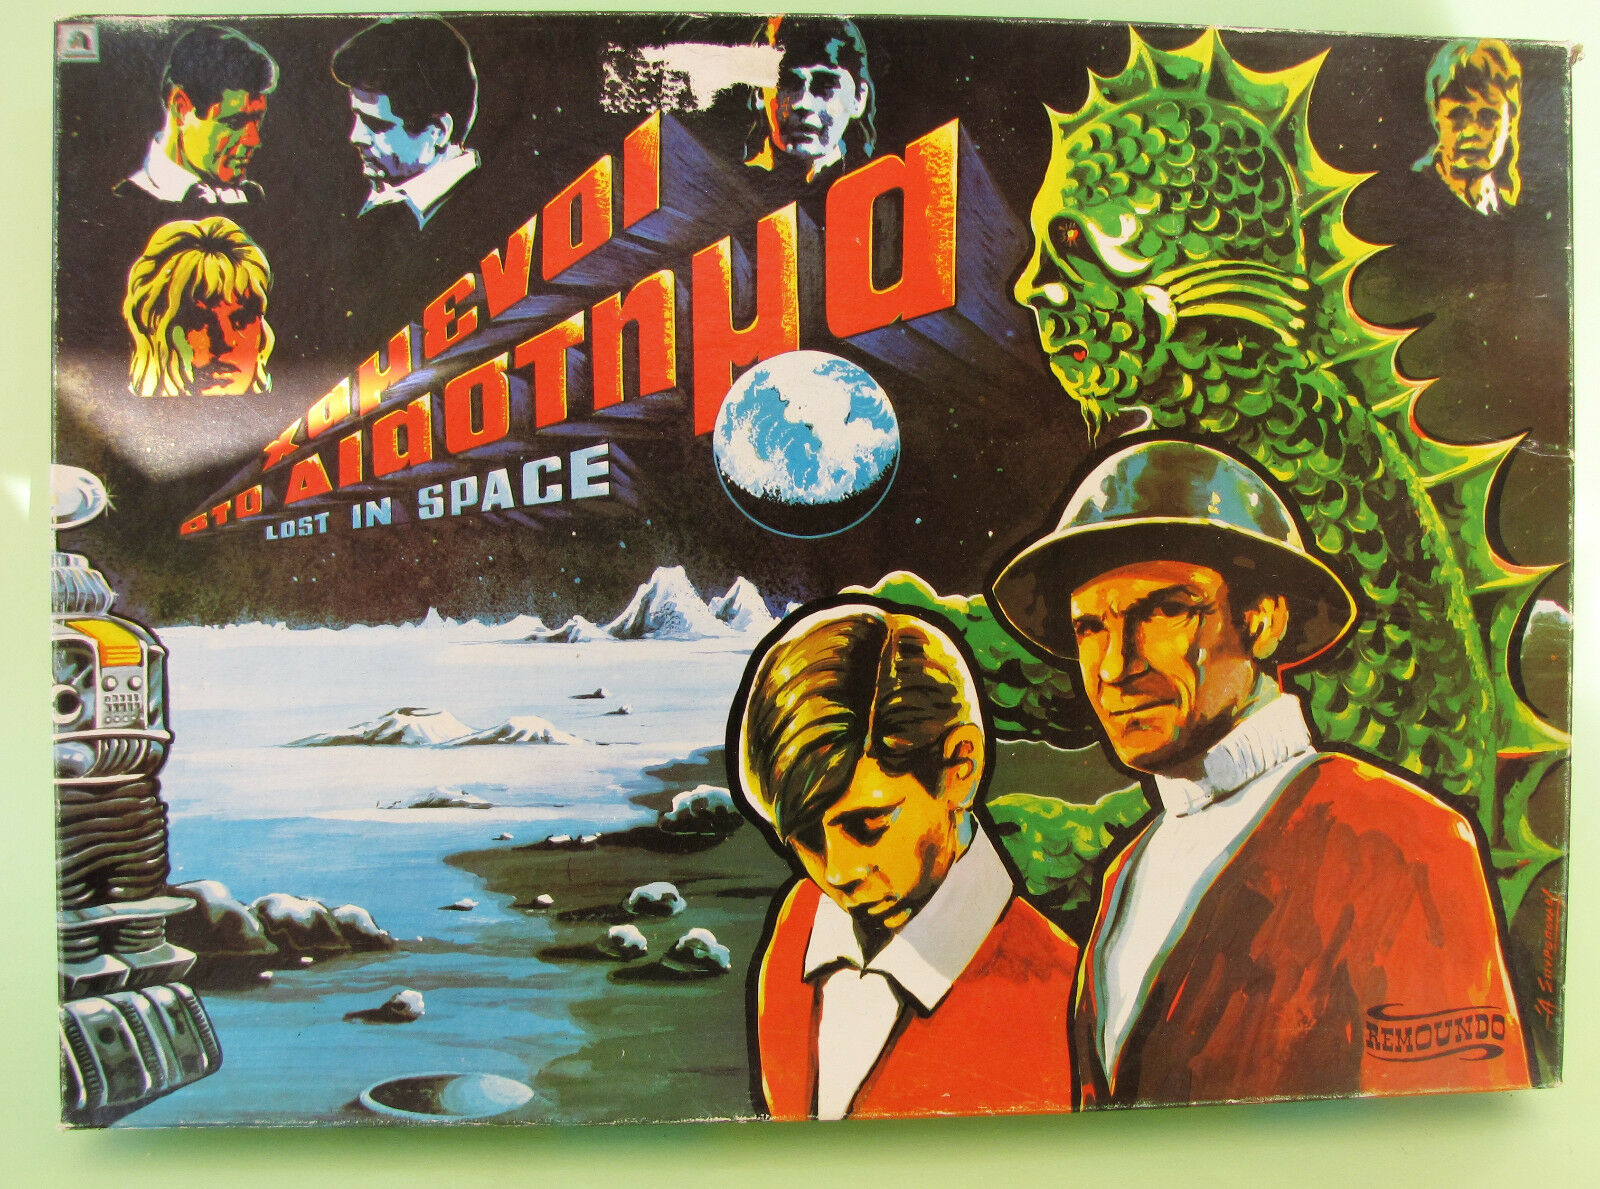 Top Rare Geniue Greek Board Game Lost In Space Remoundo 60's